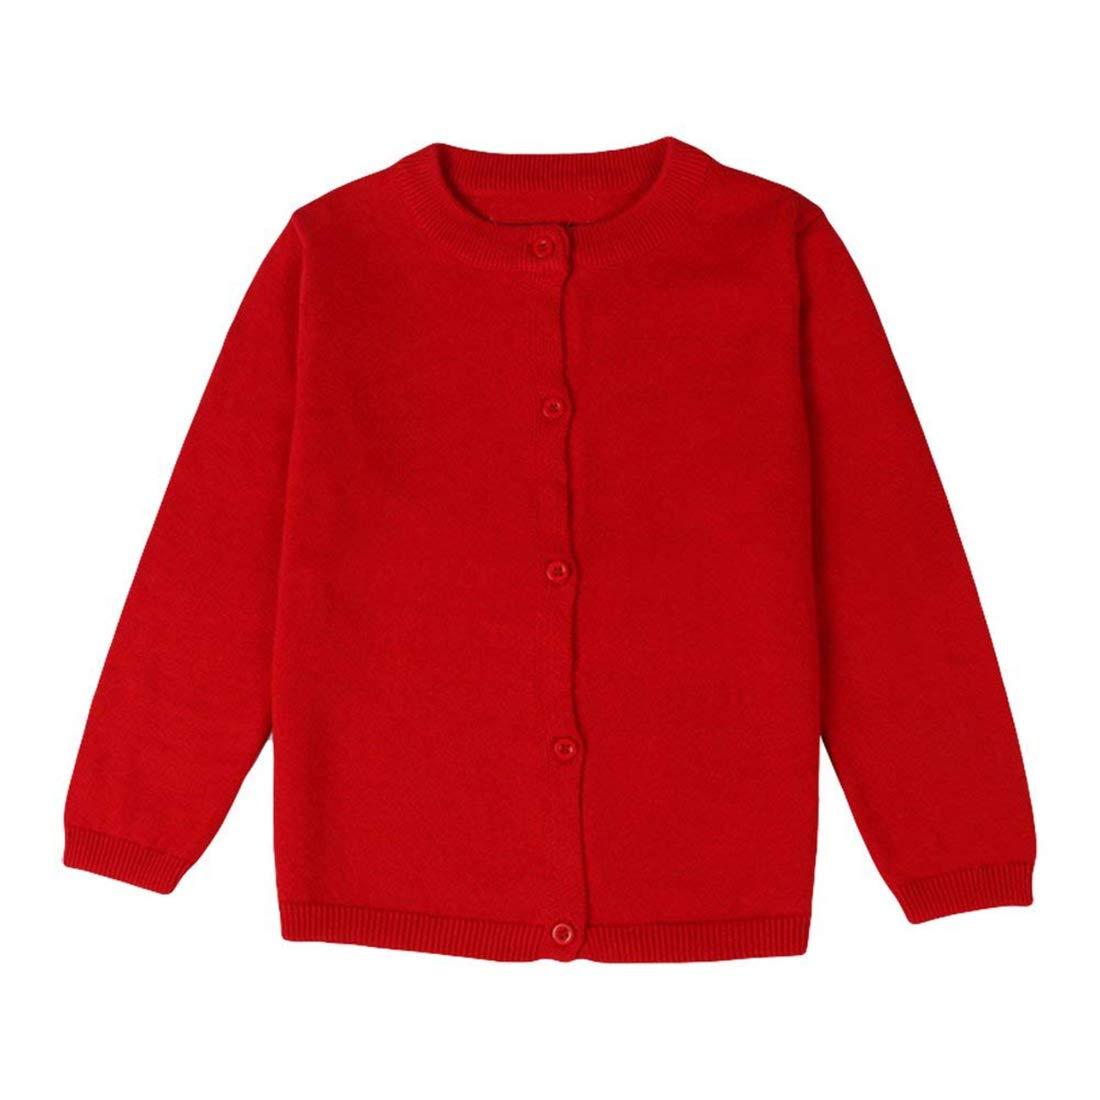 Dutebare Girls Crewneck Cardigan Toddler Long Sleeve Sweaters Button Uniform Cardigans Red 6